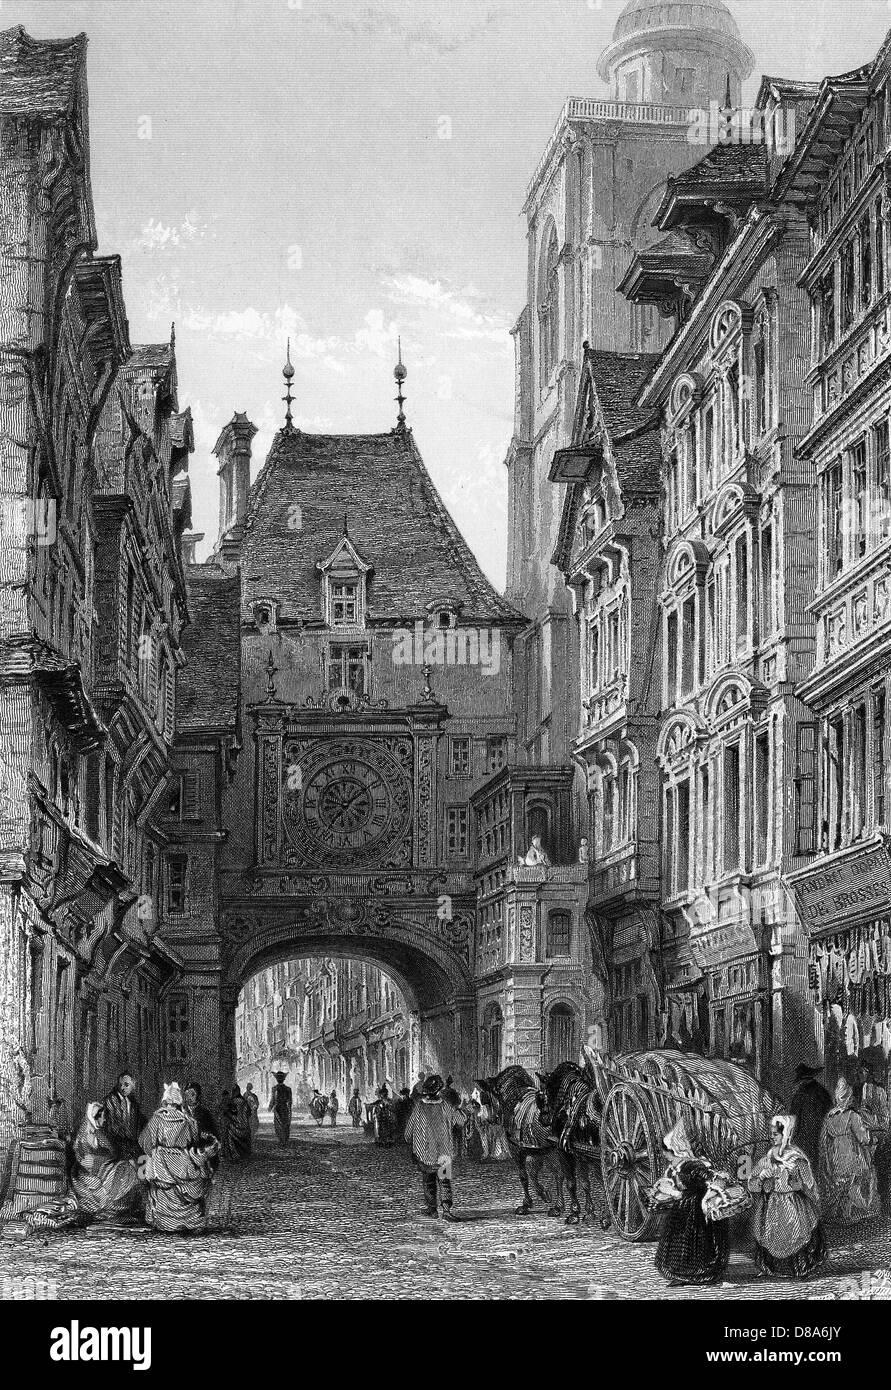 France Rouen - Stock Image